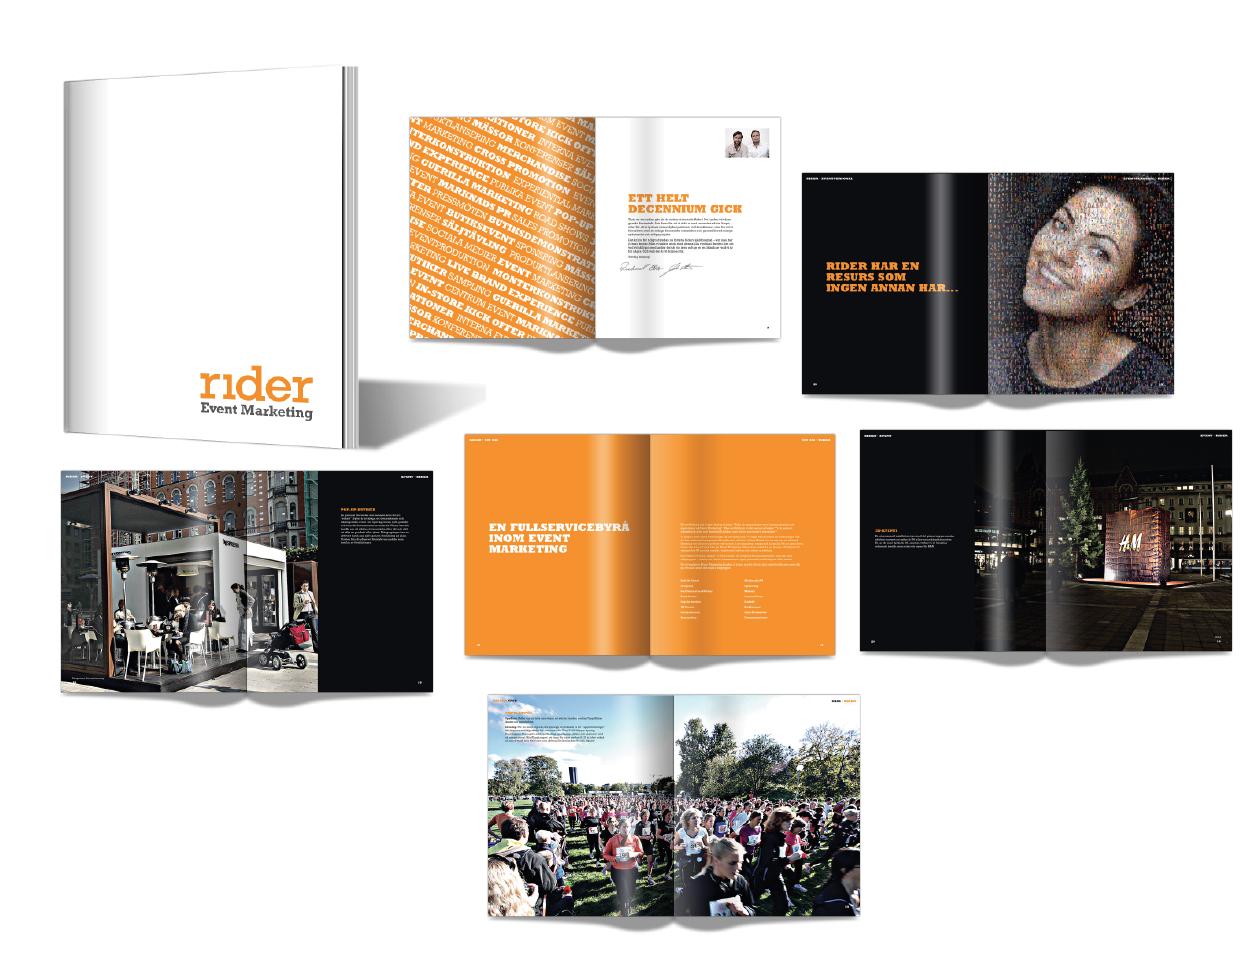 Design of book Rider eventmarketing